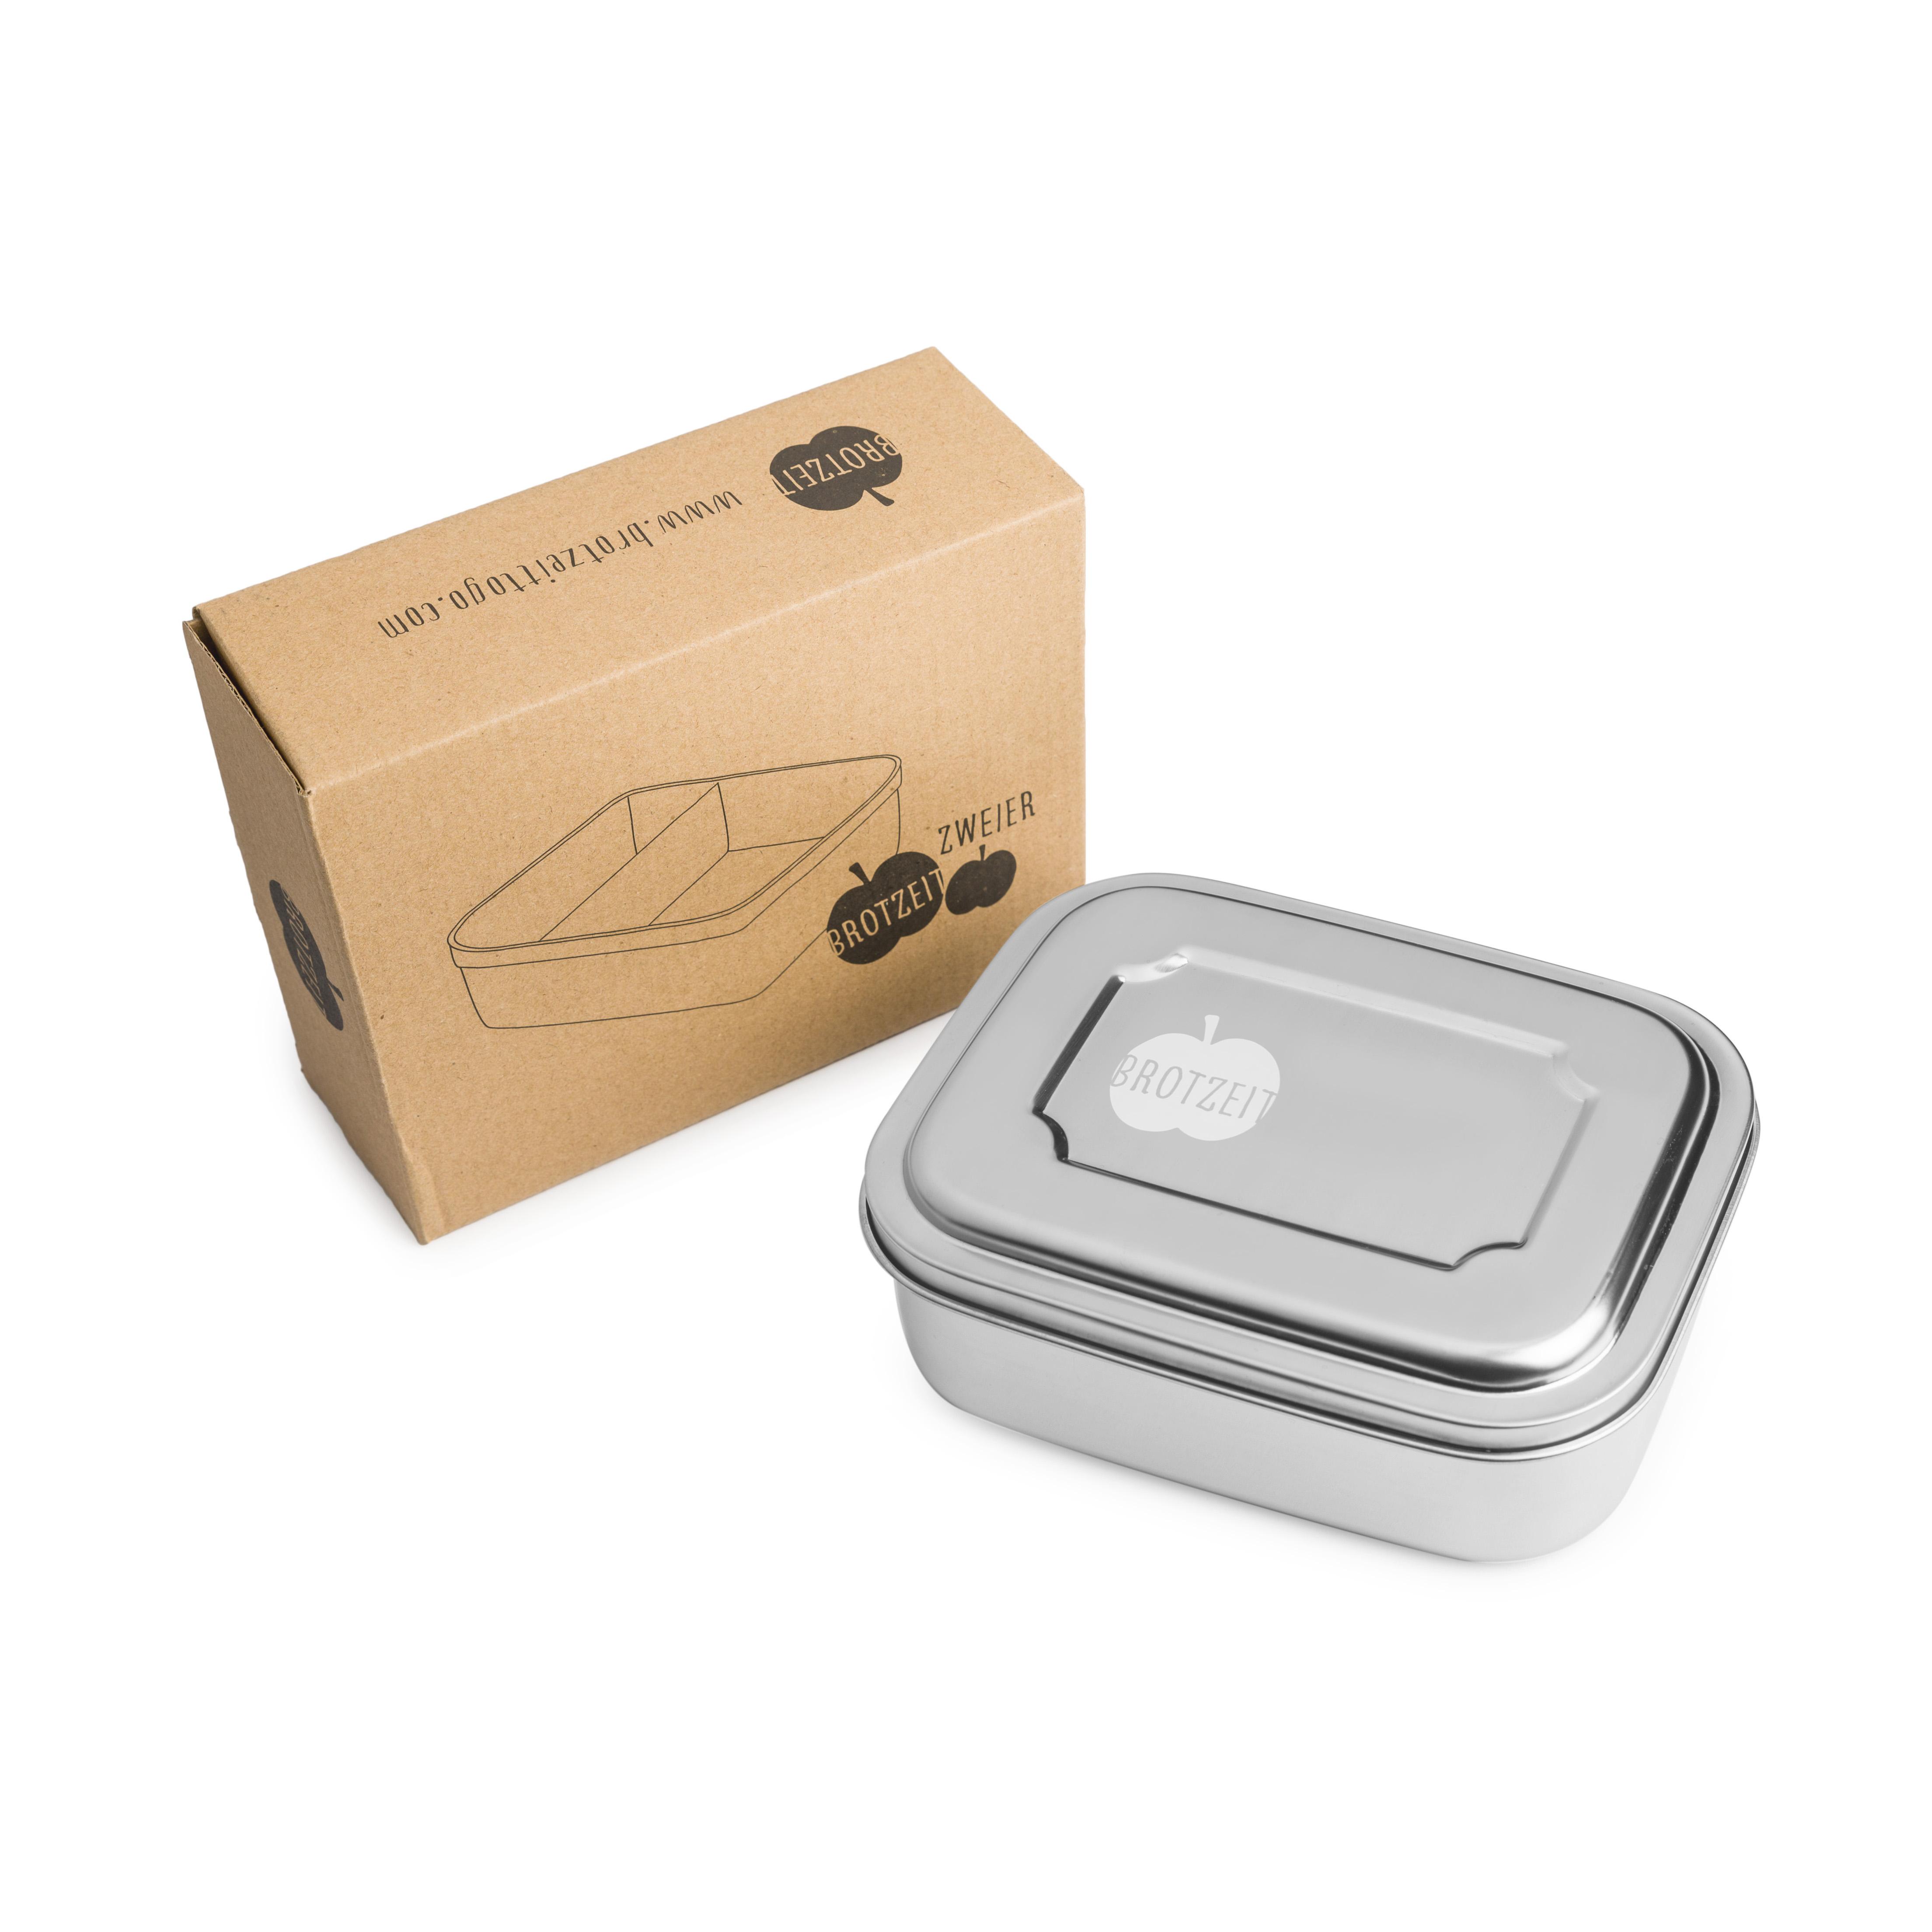 lunchboxen aus edelstahl bpa freie brotdosen mehr pure and green. Black Bedroom Furniture Sets. Home Design Ideas